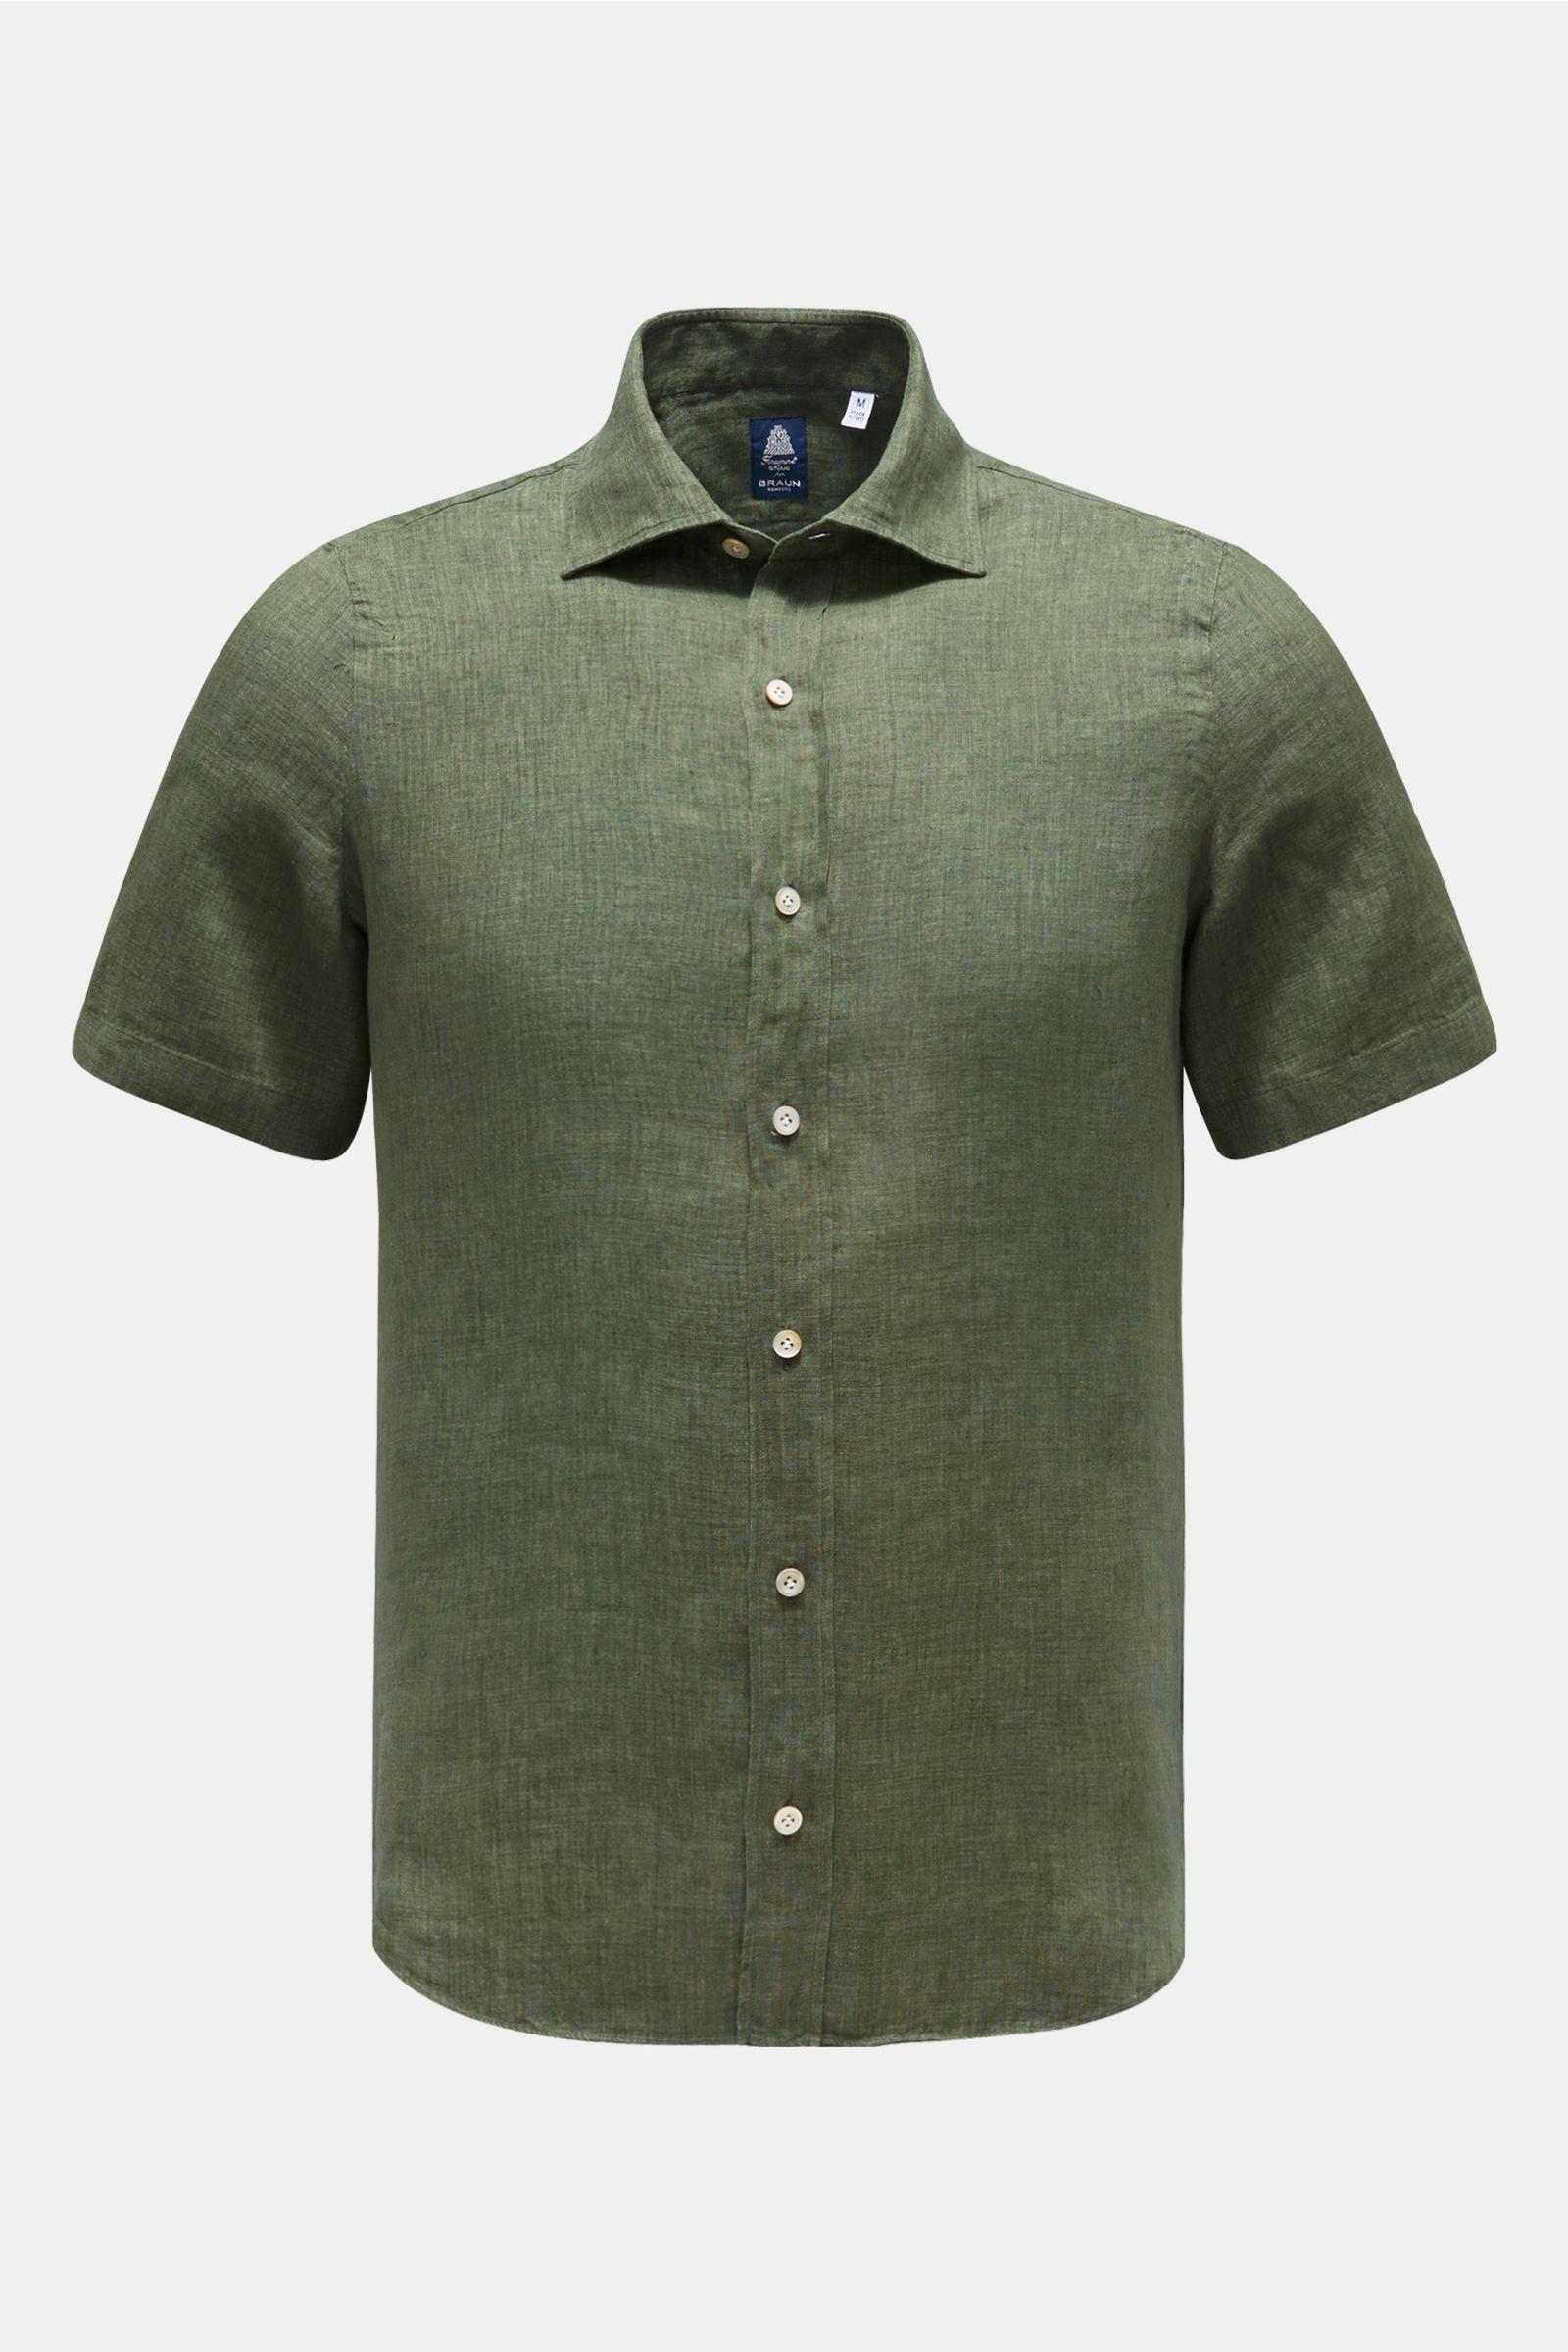 Linen short sleeve shirt 'Luigi Giglio' narrow collar olive